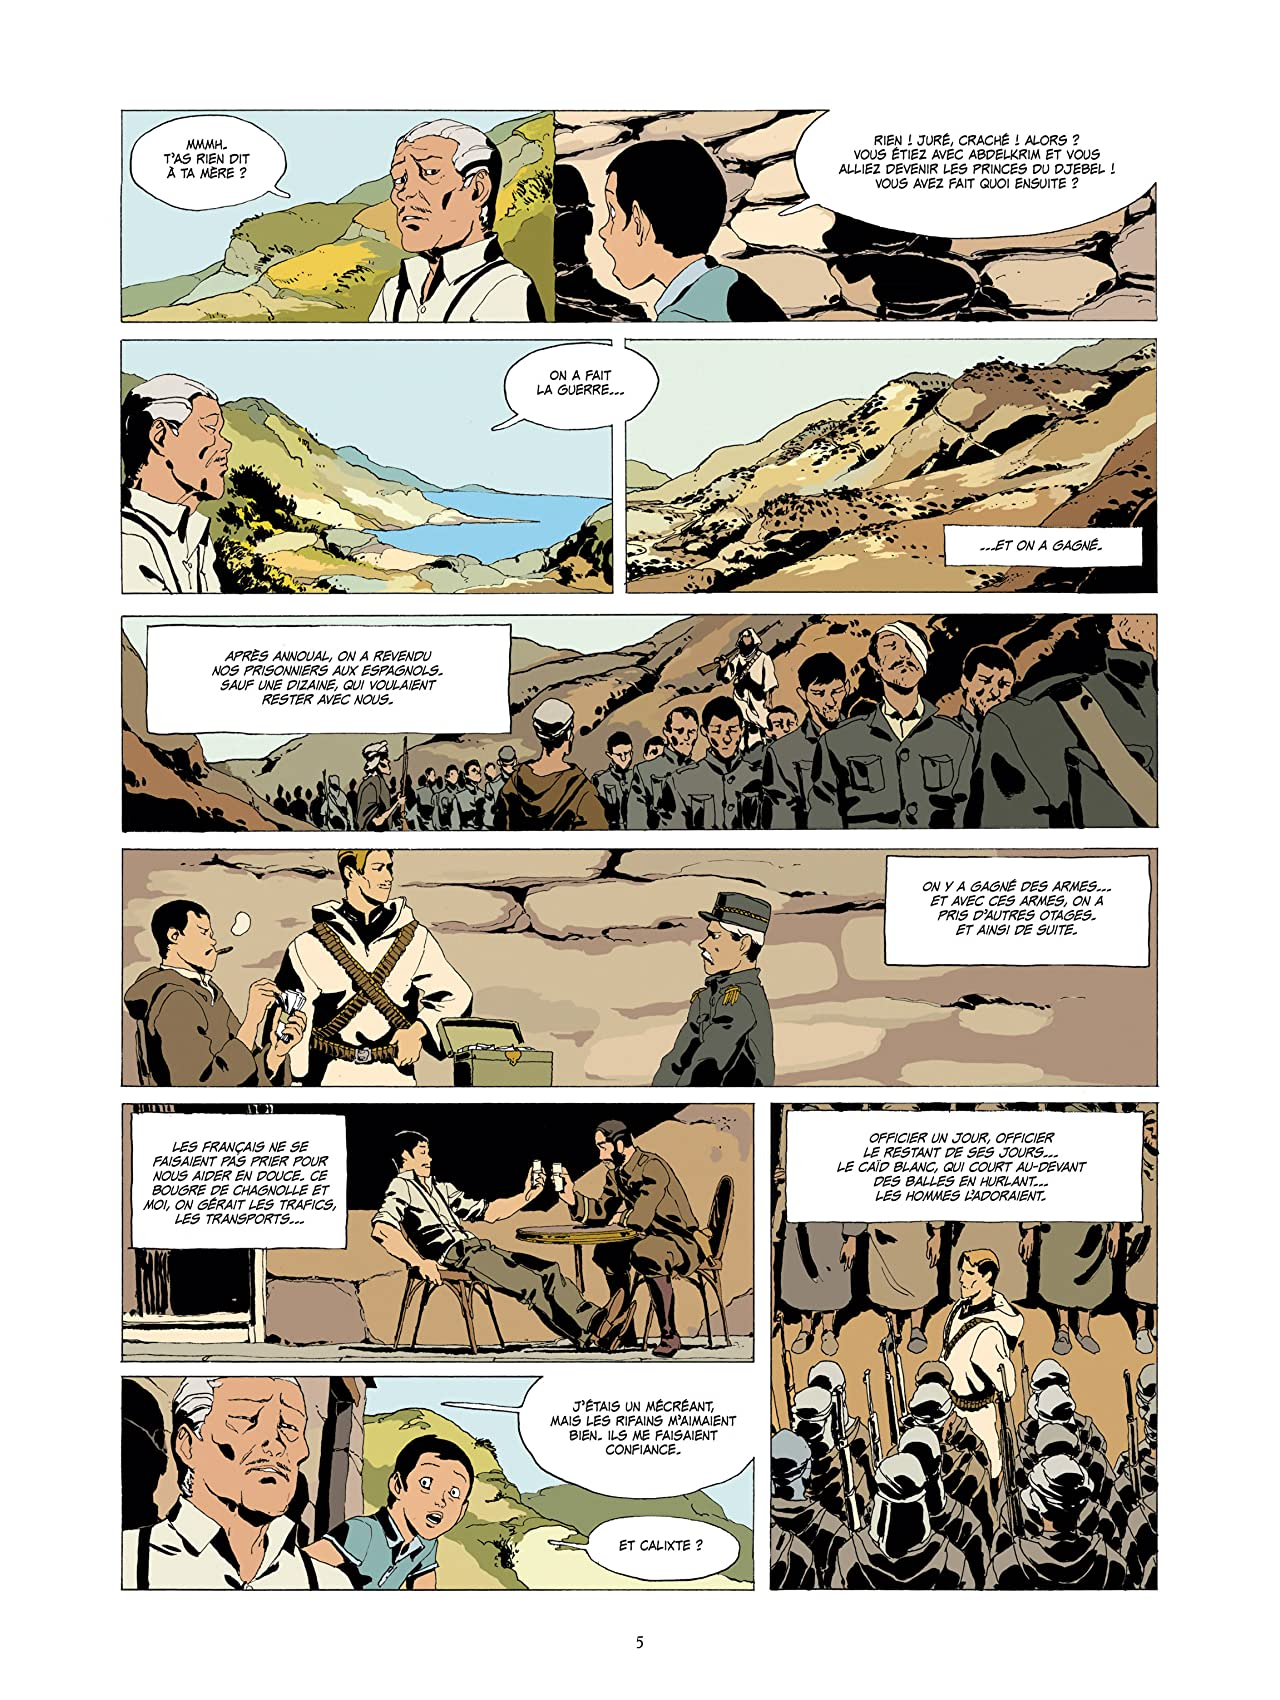 L'Or et le Sang Vol. 3: Les princes du Djebel